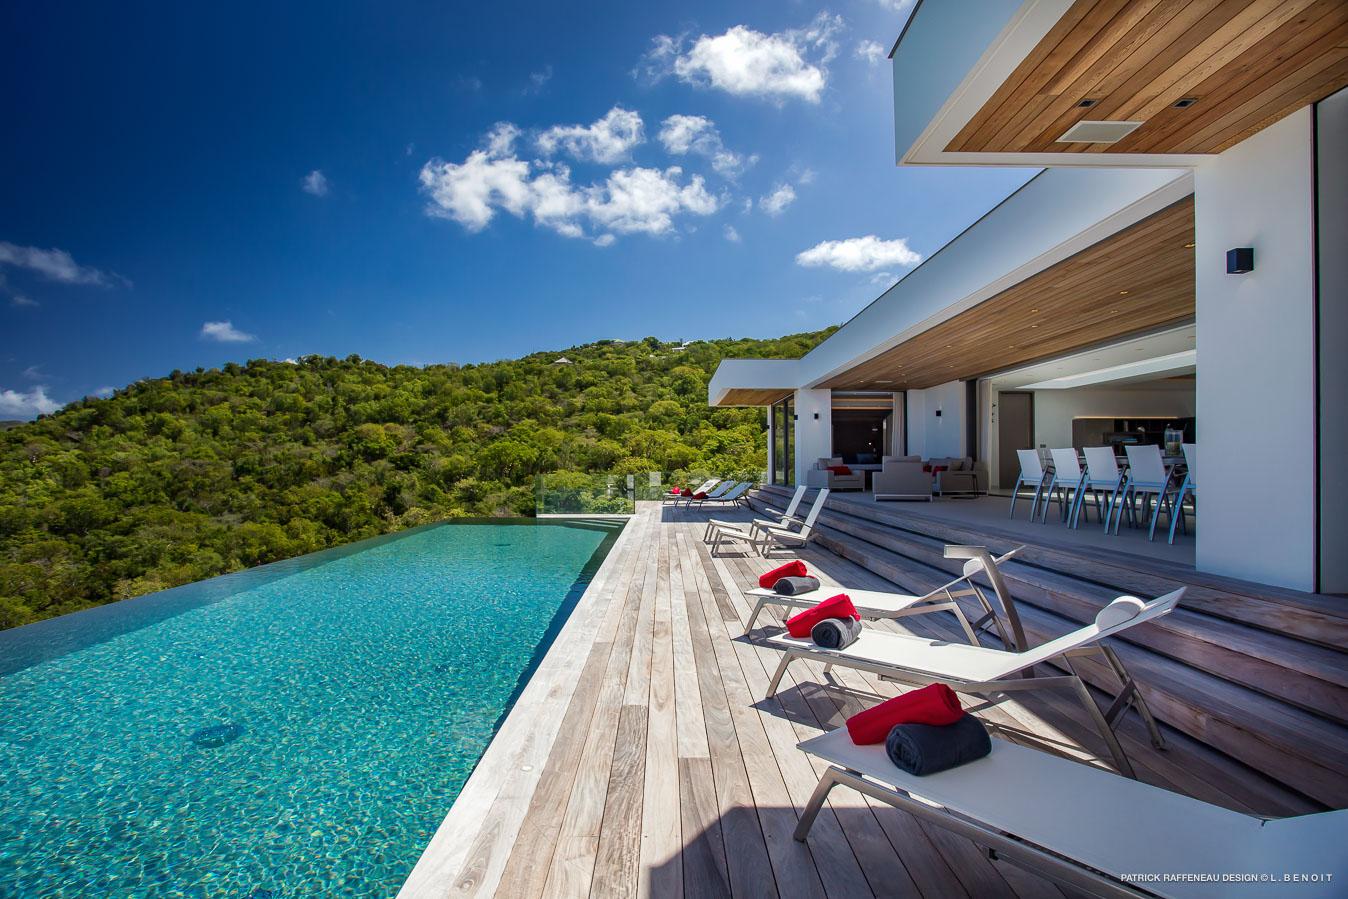 Villa Joel Sublet Antilles